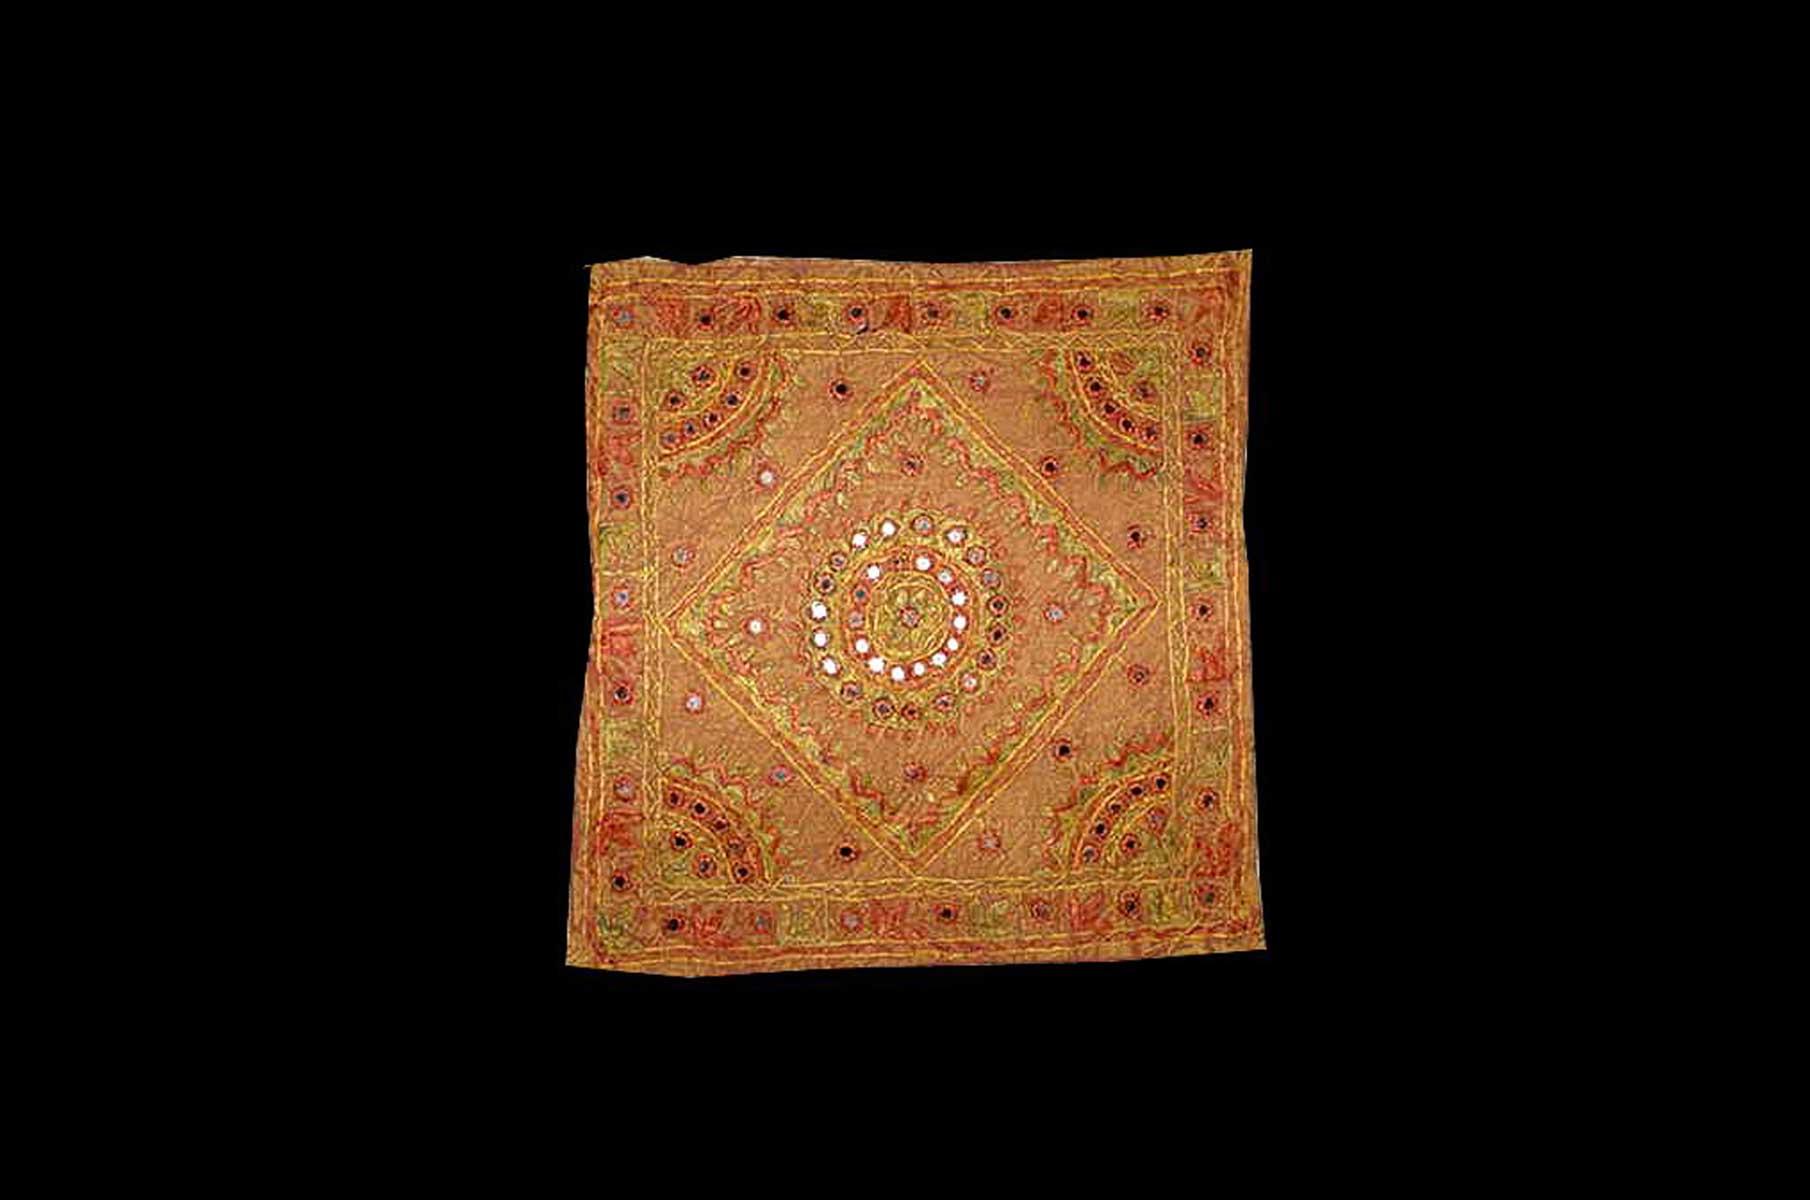 Kashmir Artizan Udaipur Cushion Covers Sofa Cushions  : 36 from indianpurepashmina.com size 1810 x 1200 jpeg 100kB